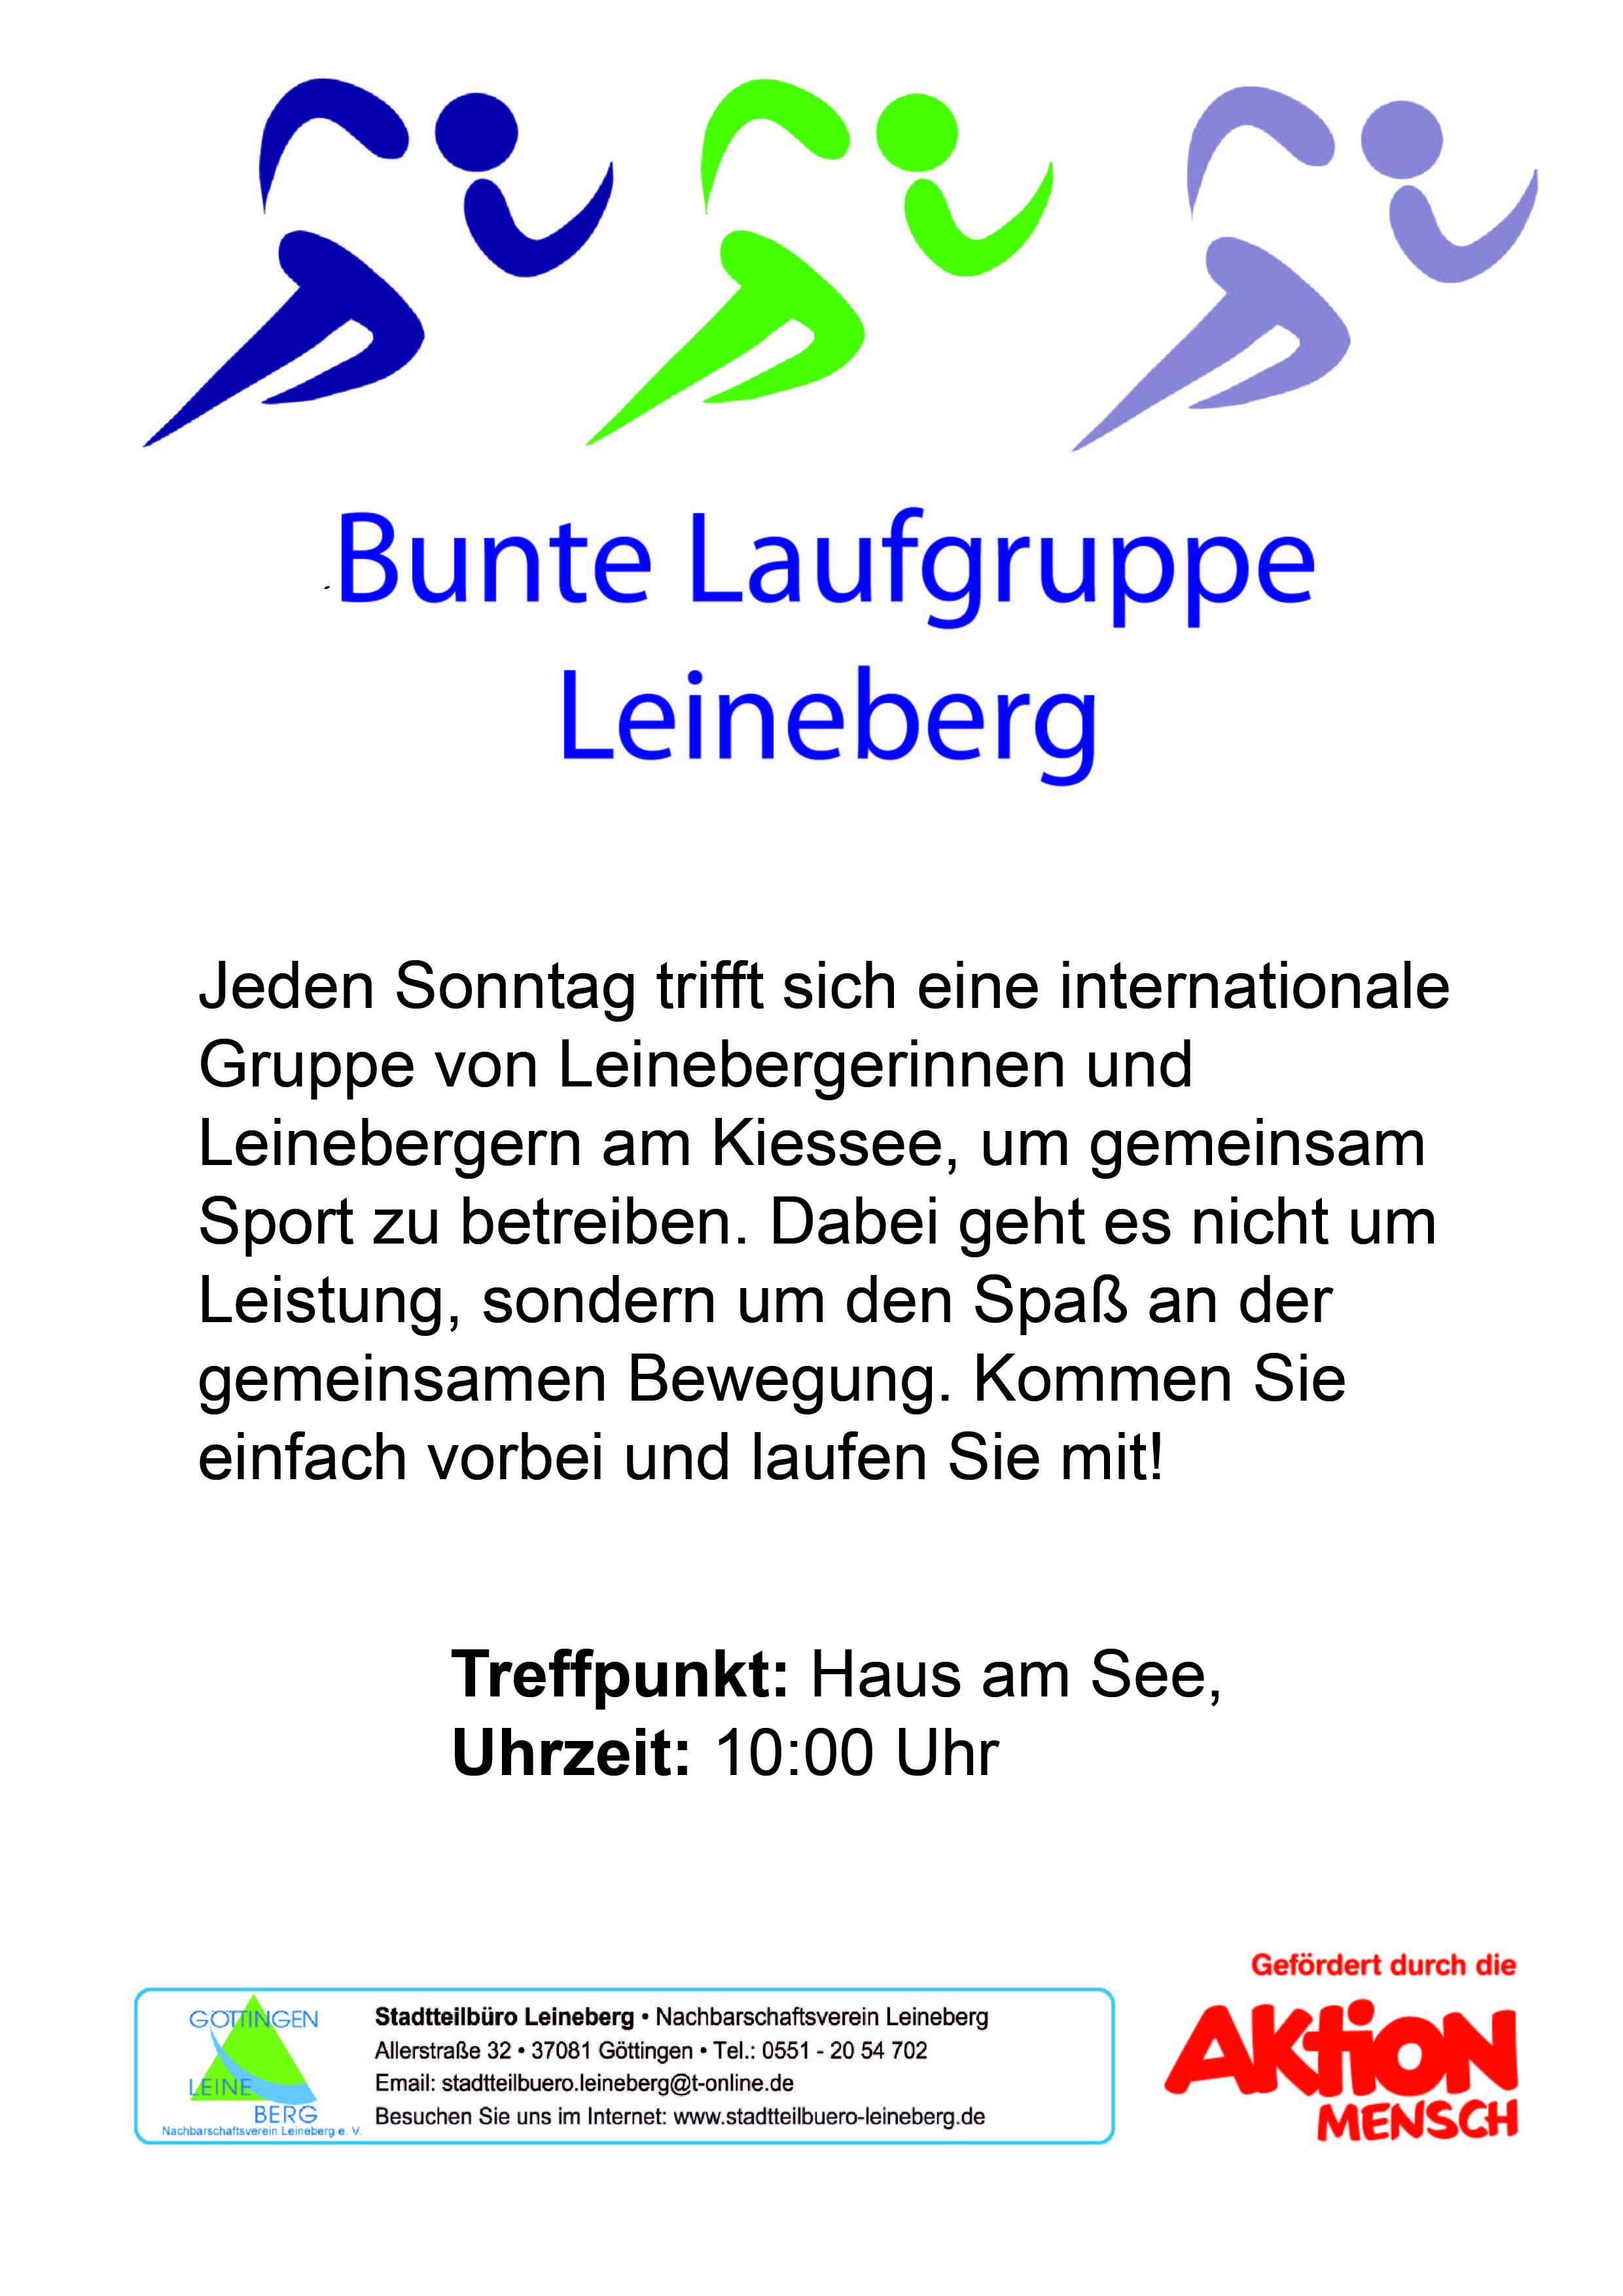 http://www.stadtteilbuero-leineberg.de/files/2019-02_laufgruppe-01.jpg